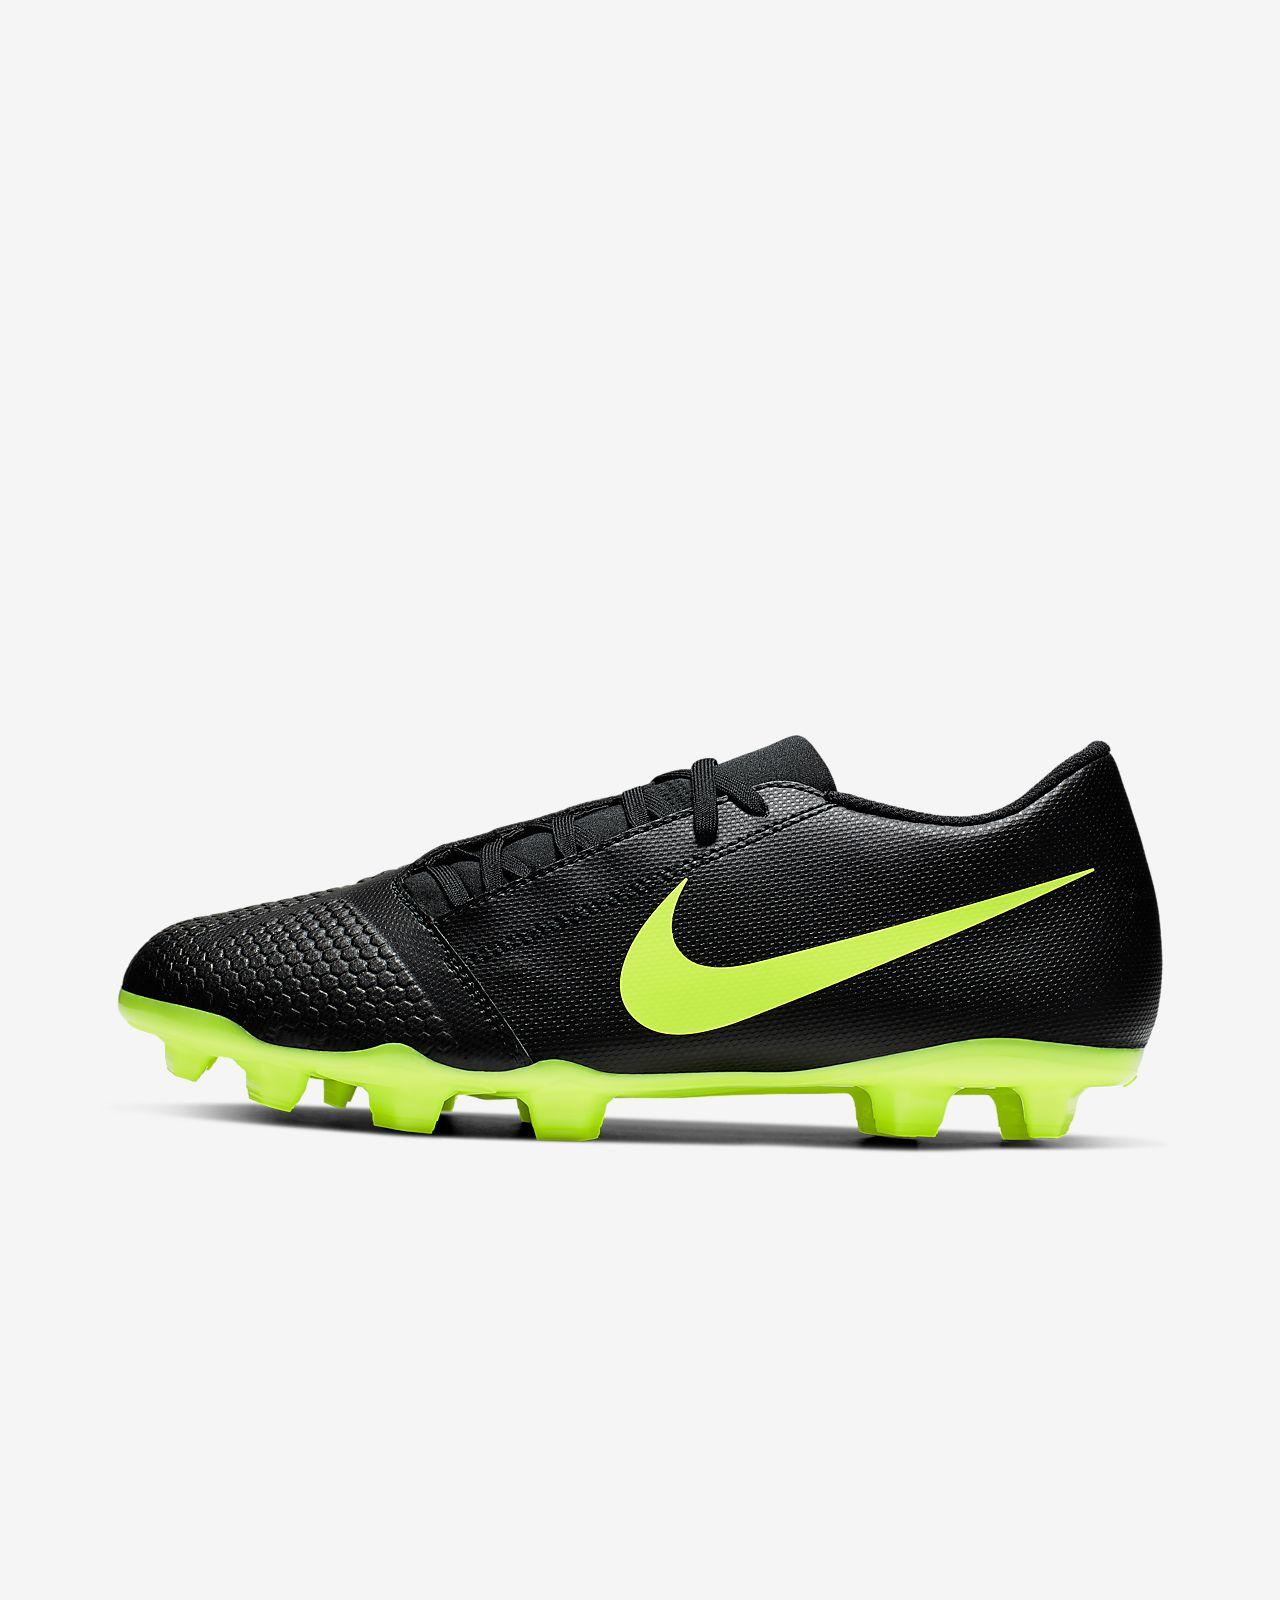 Nike PhantomVNM Club FG Firm-Ground Football Boot